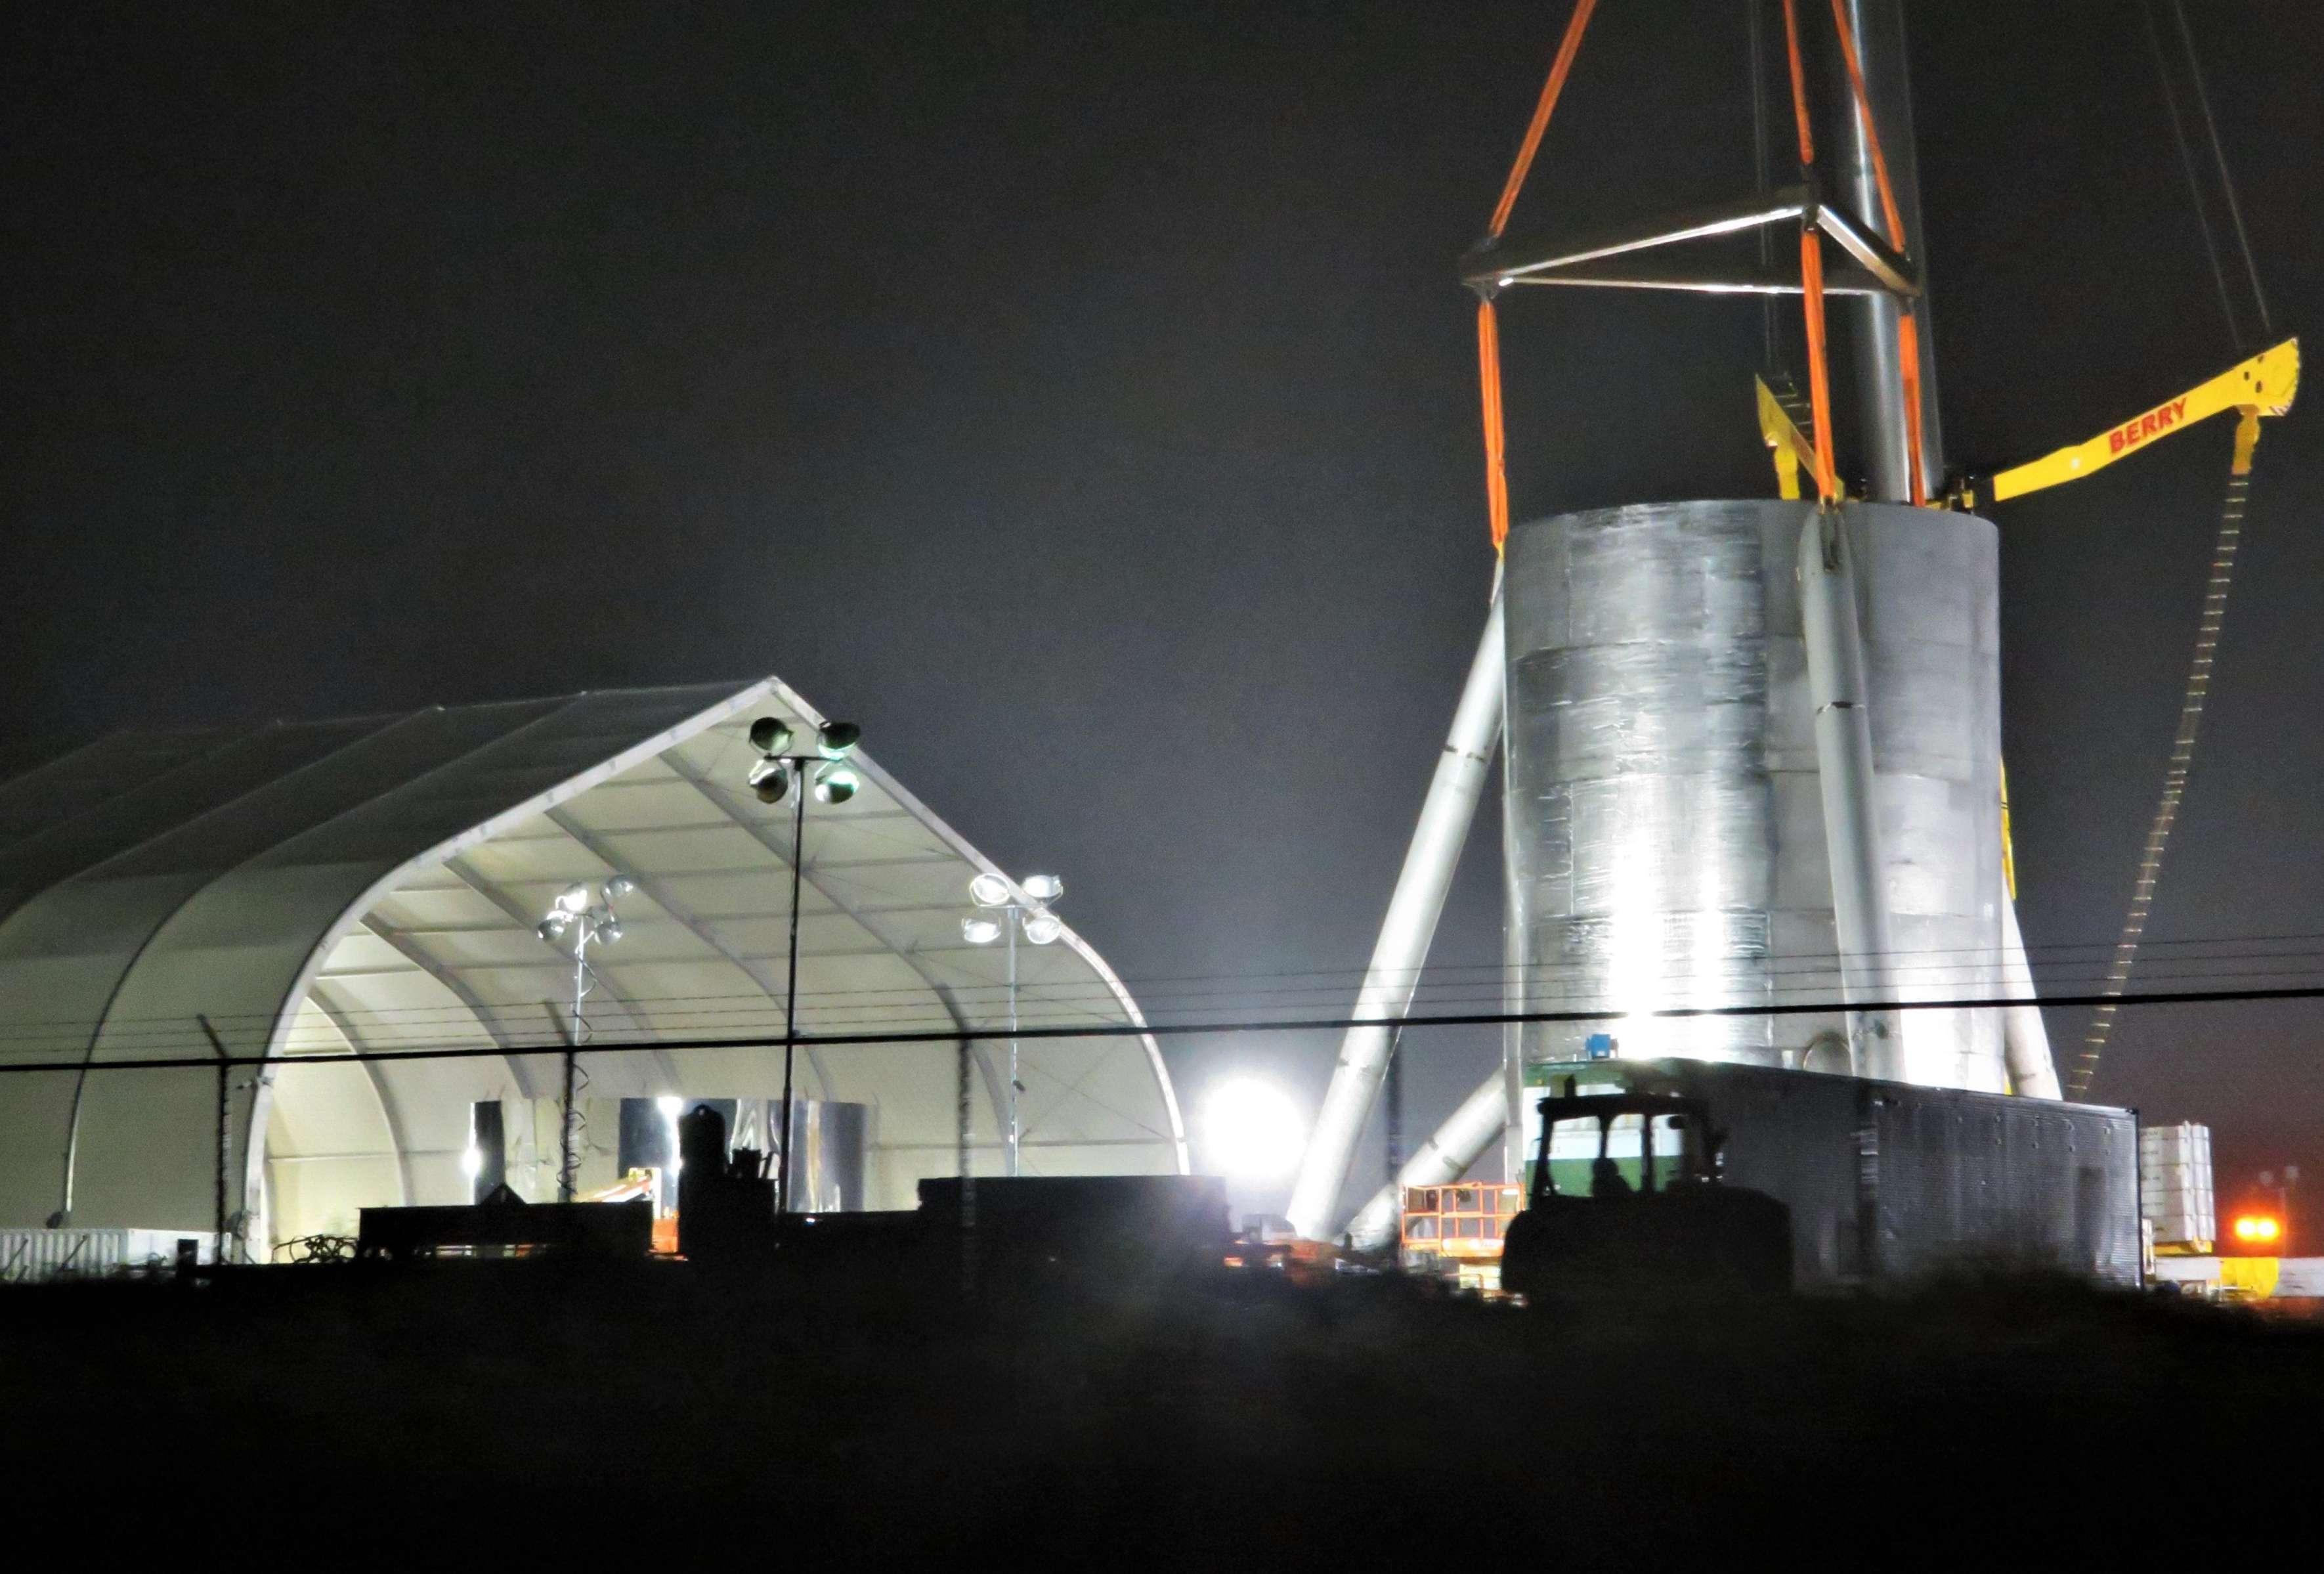 Boca Chica Starship progress 123018 (NSF – bocachicagal) 4(c)